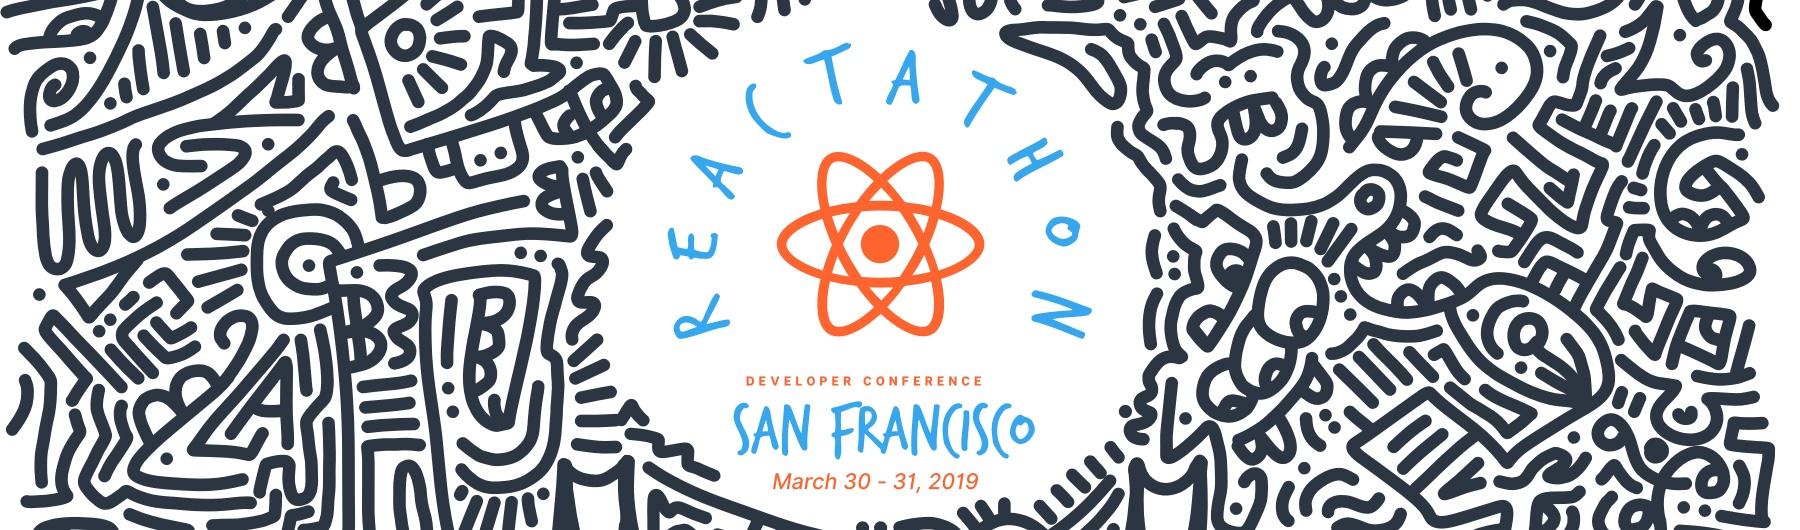 Reactathon - Data Visualizations with React & D3 Workshop